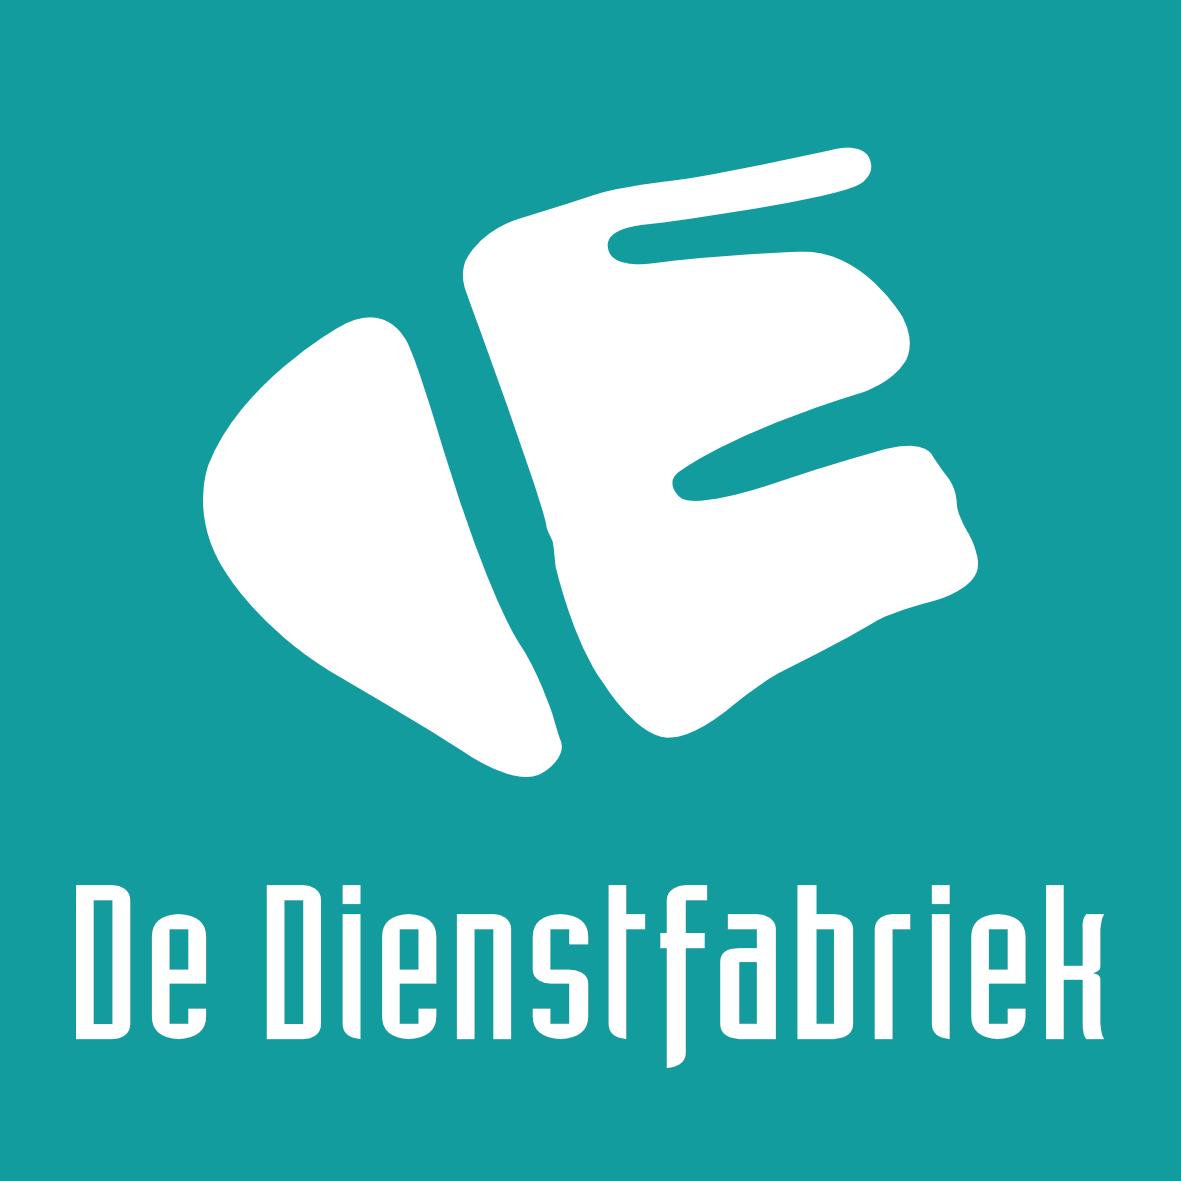 Logo_Dienstfabriek_RGB